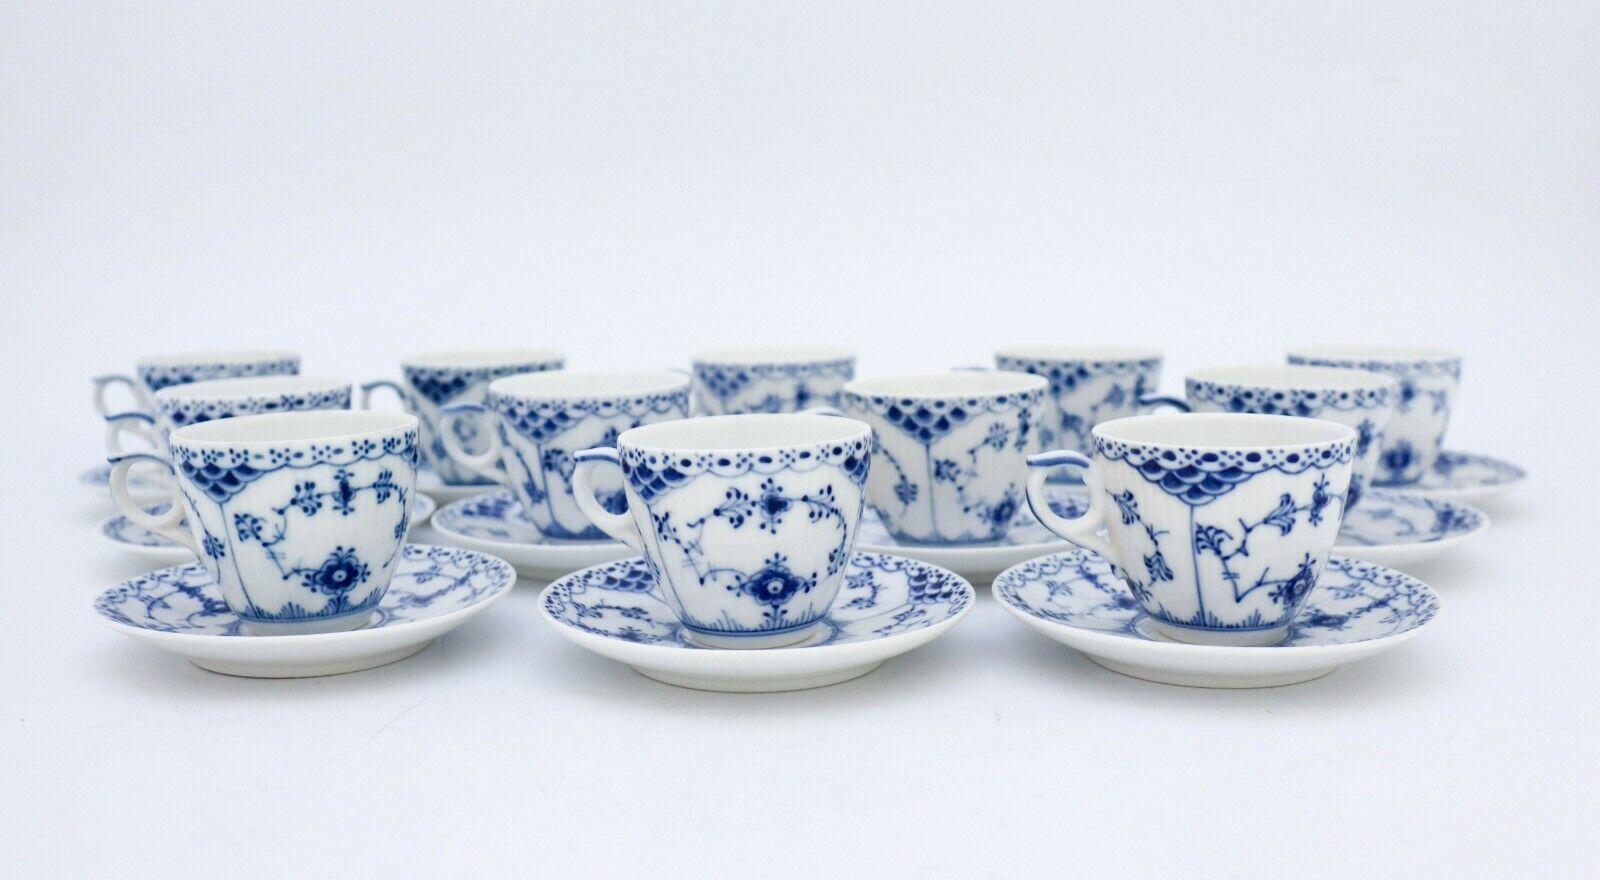 Image 2 - 12 Cups & Saucers #528 - Blue Fluted Royal Copenhagen - Half Lace - 1:st Quality